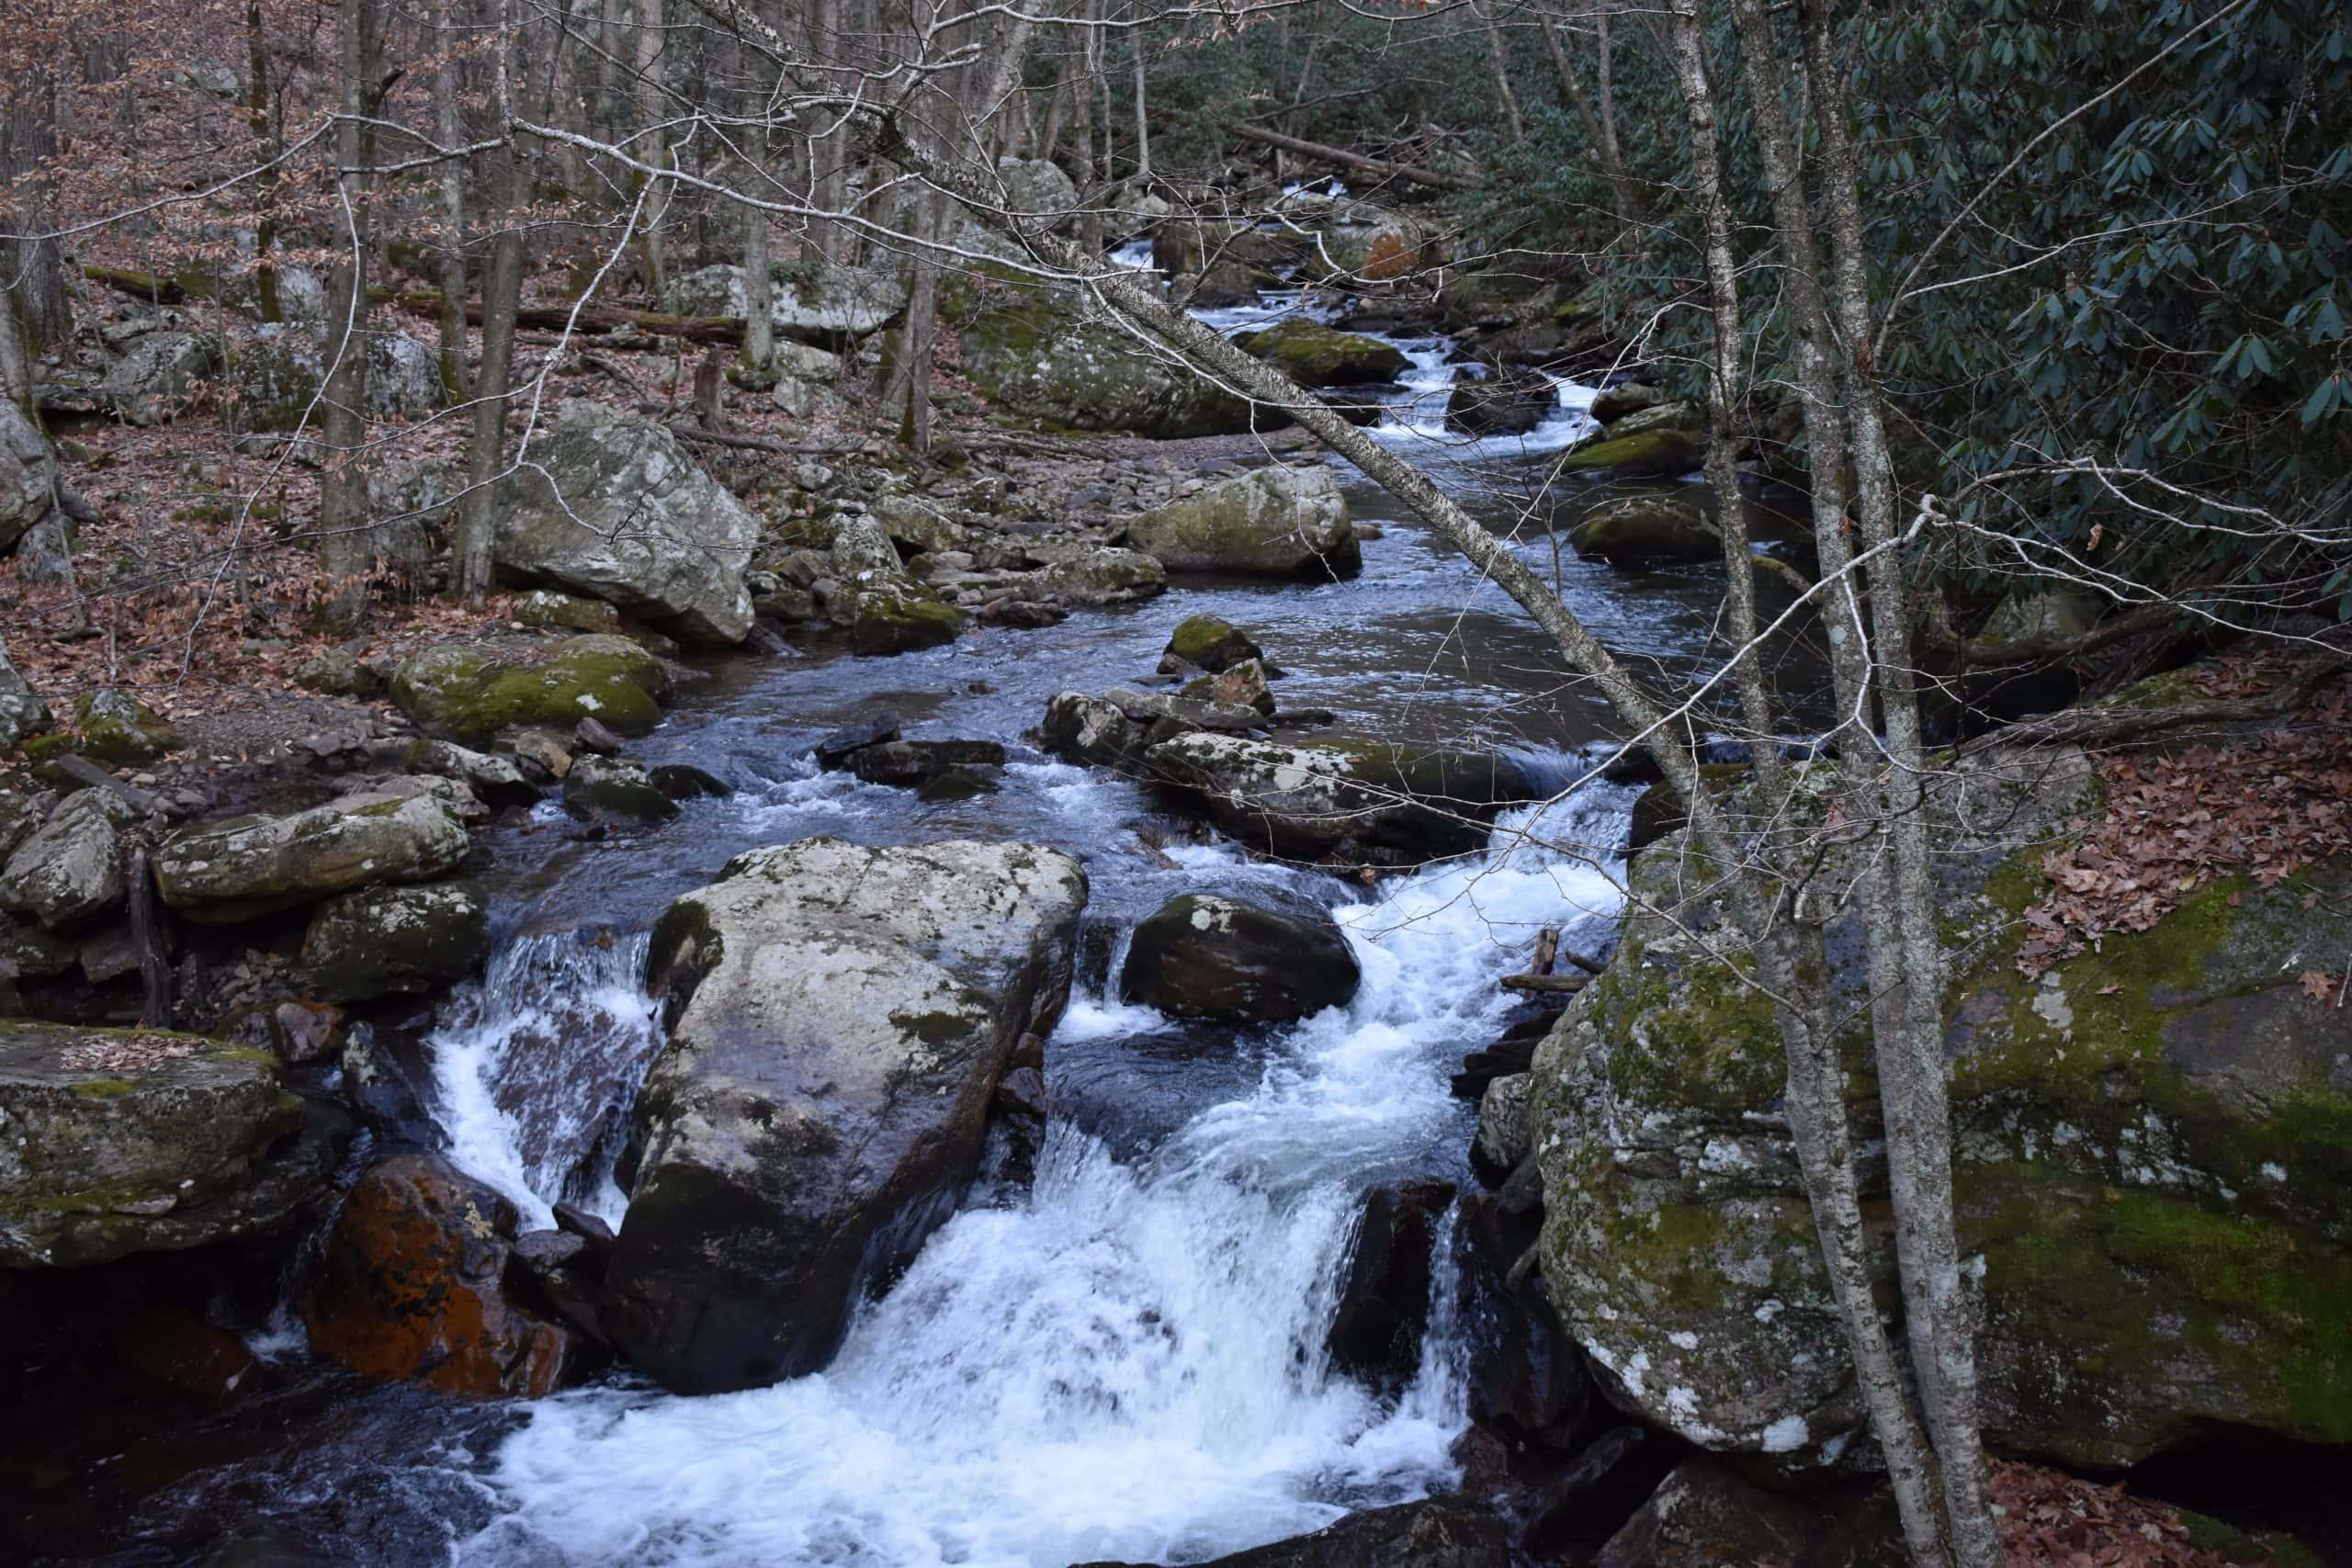 cascades falls trails va - yoanoke - rapid water